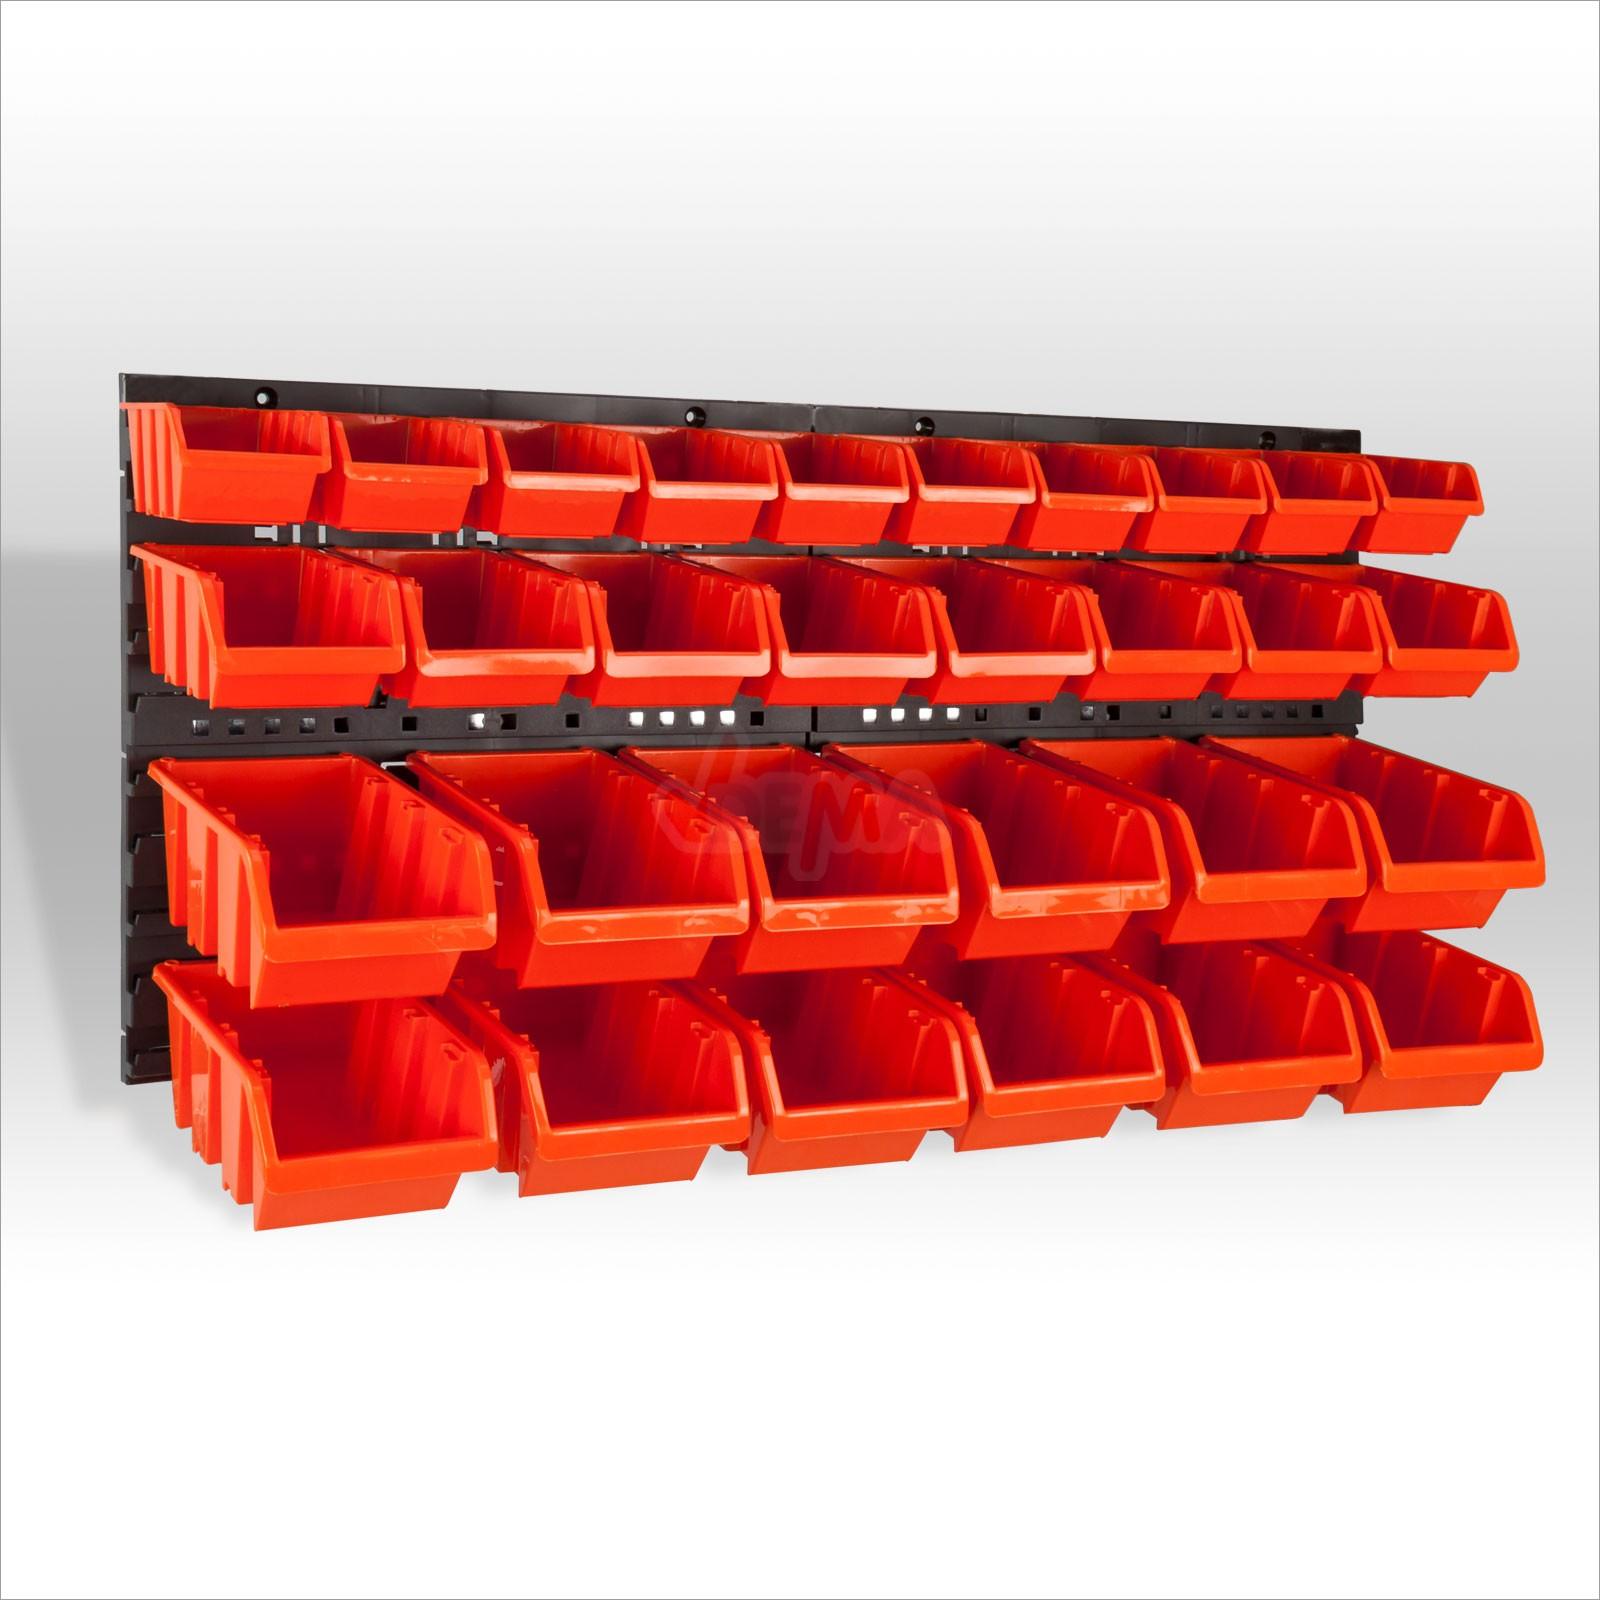 sch ttenregal sch tten kleinteileregal regal mit 30 boxen. Black Bedroom Furniture Sets. Home Design Ideas